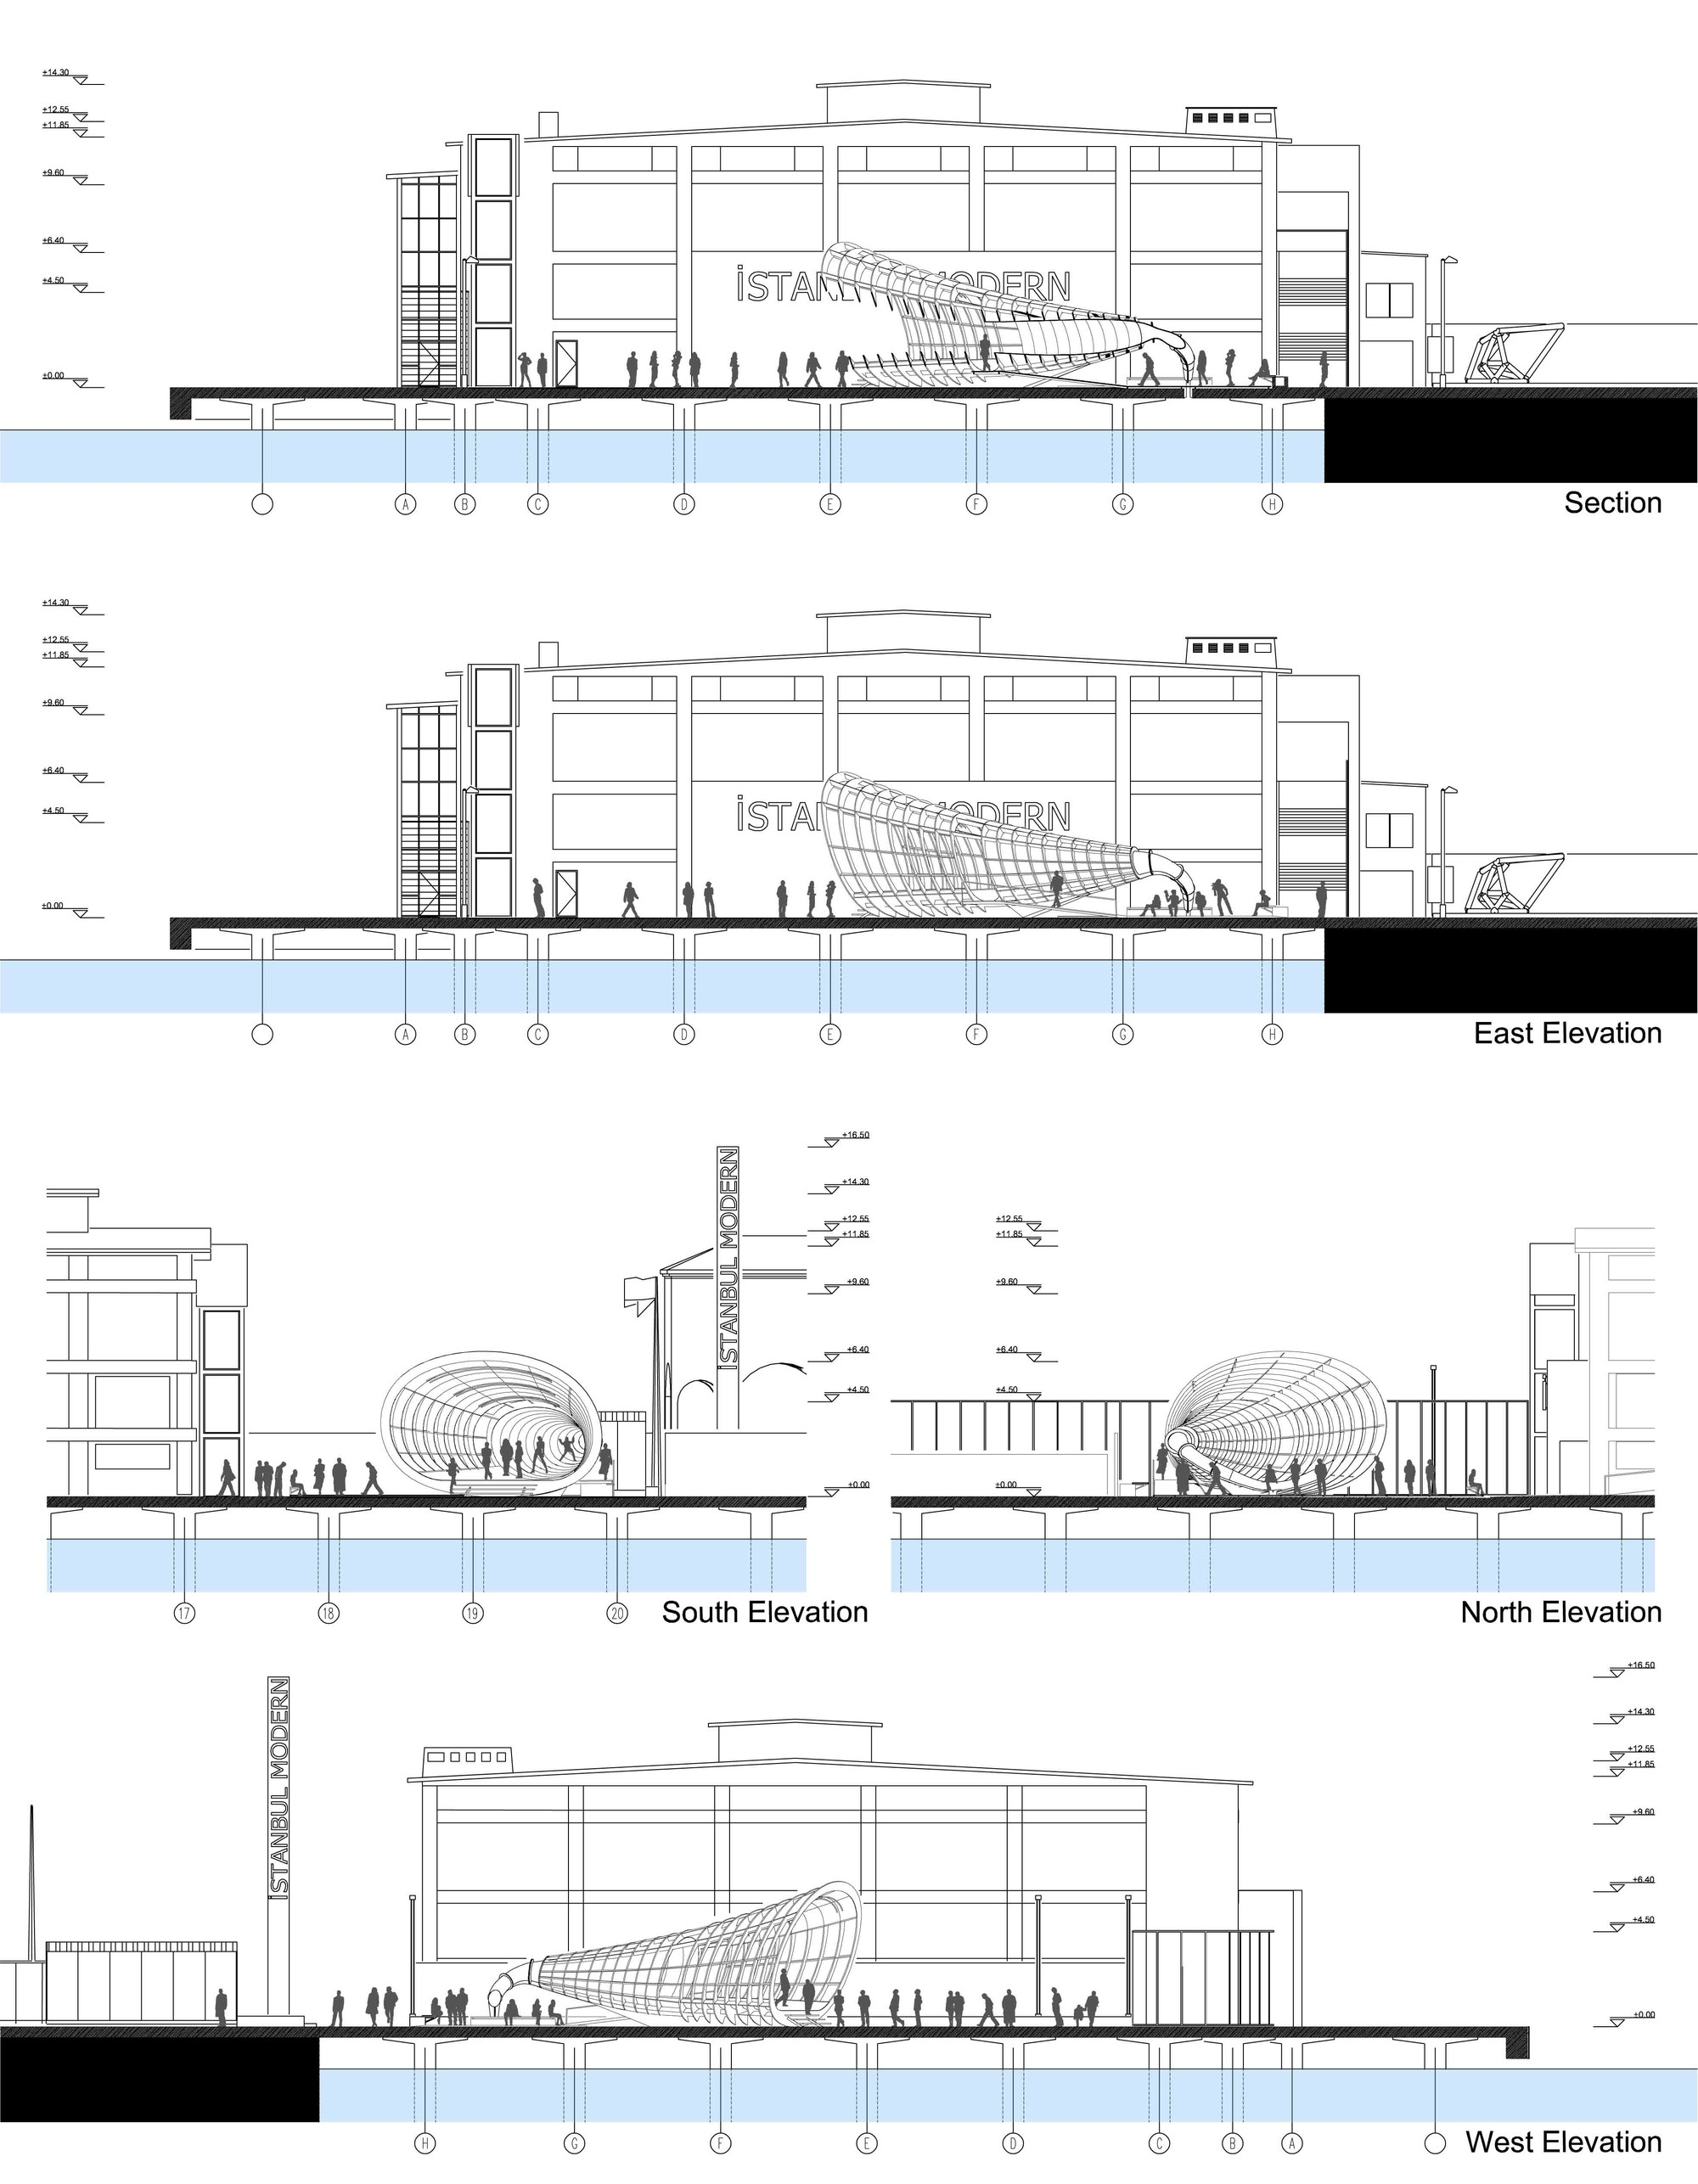 'Seapeaker' YAP Istanbul Modern Proposal / Evren Başbuğ, İnanç Eray, Meriç Kara, Engin Ayaz /